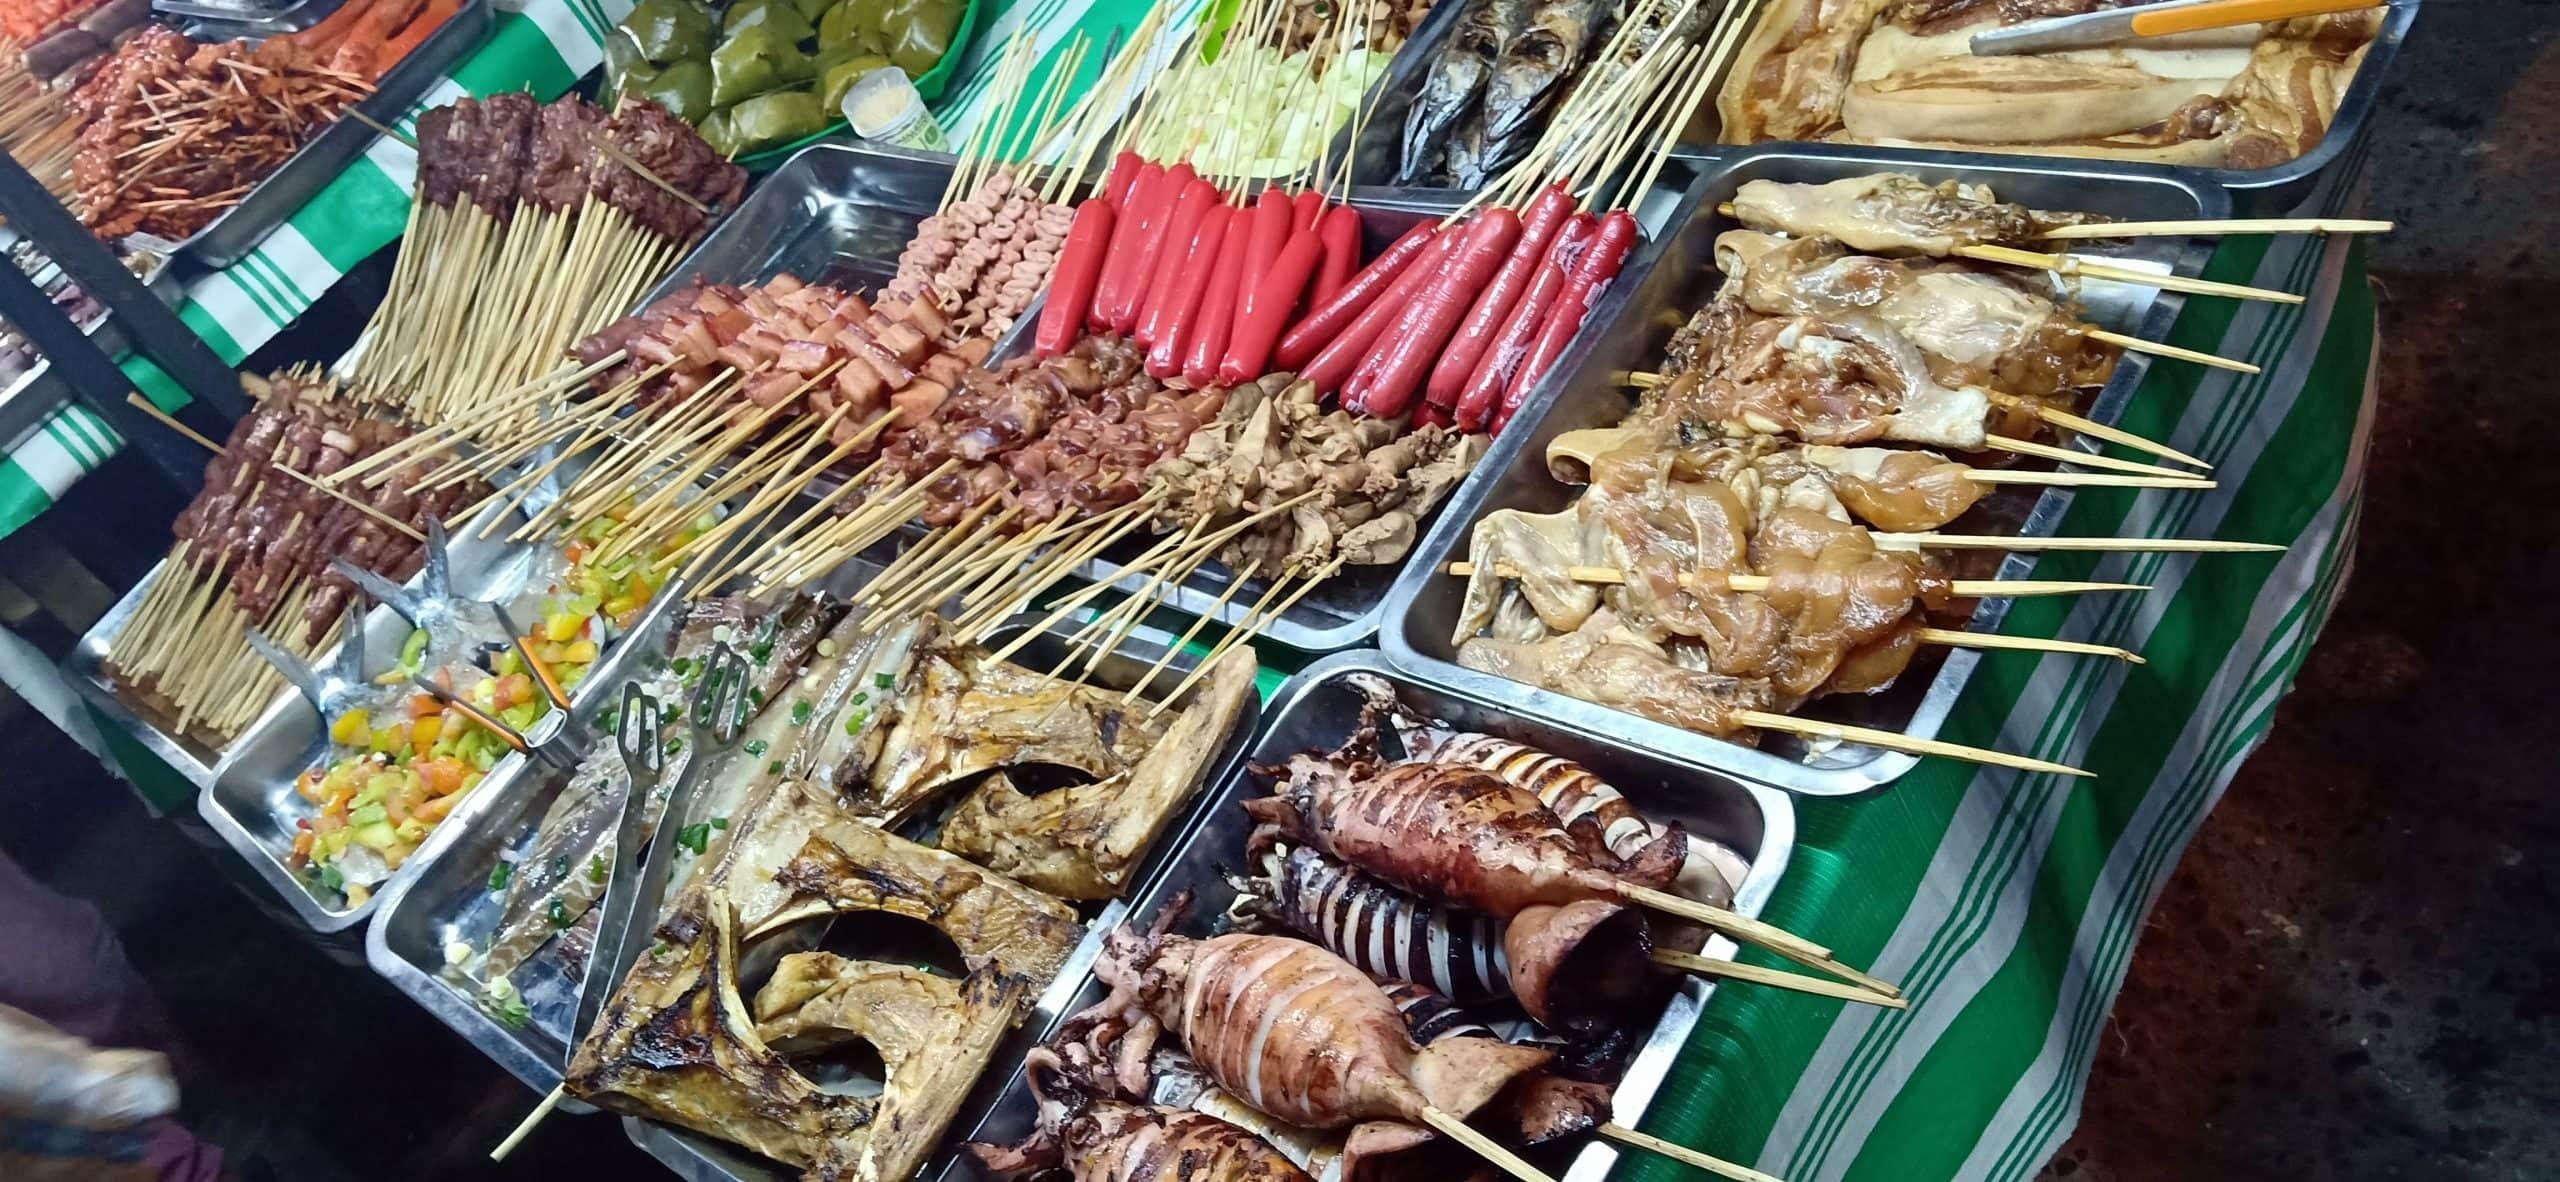 Friday Night Market Divisoria